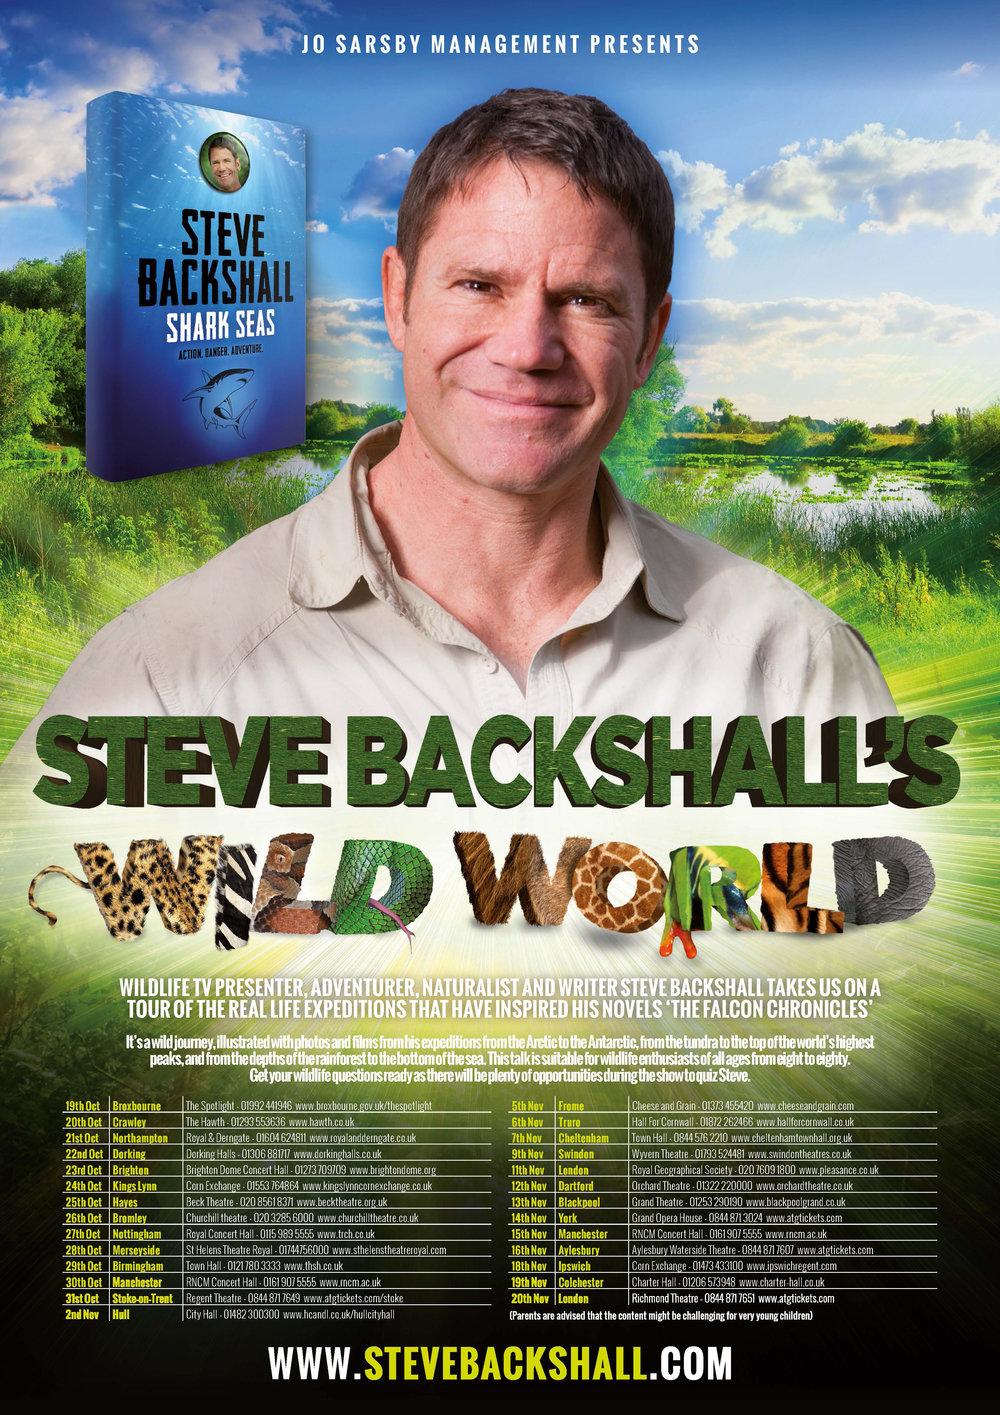 143999_SB_Wild World Poster_A2_PRINT_p1_SB_Wild World Poster_B2_PRINT_p1_Page_1.jpg